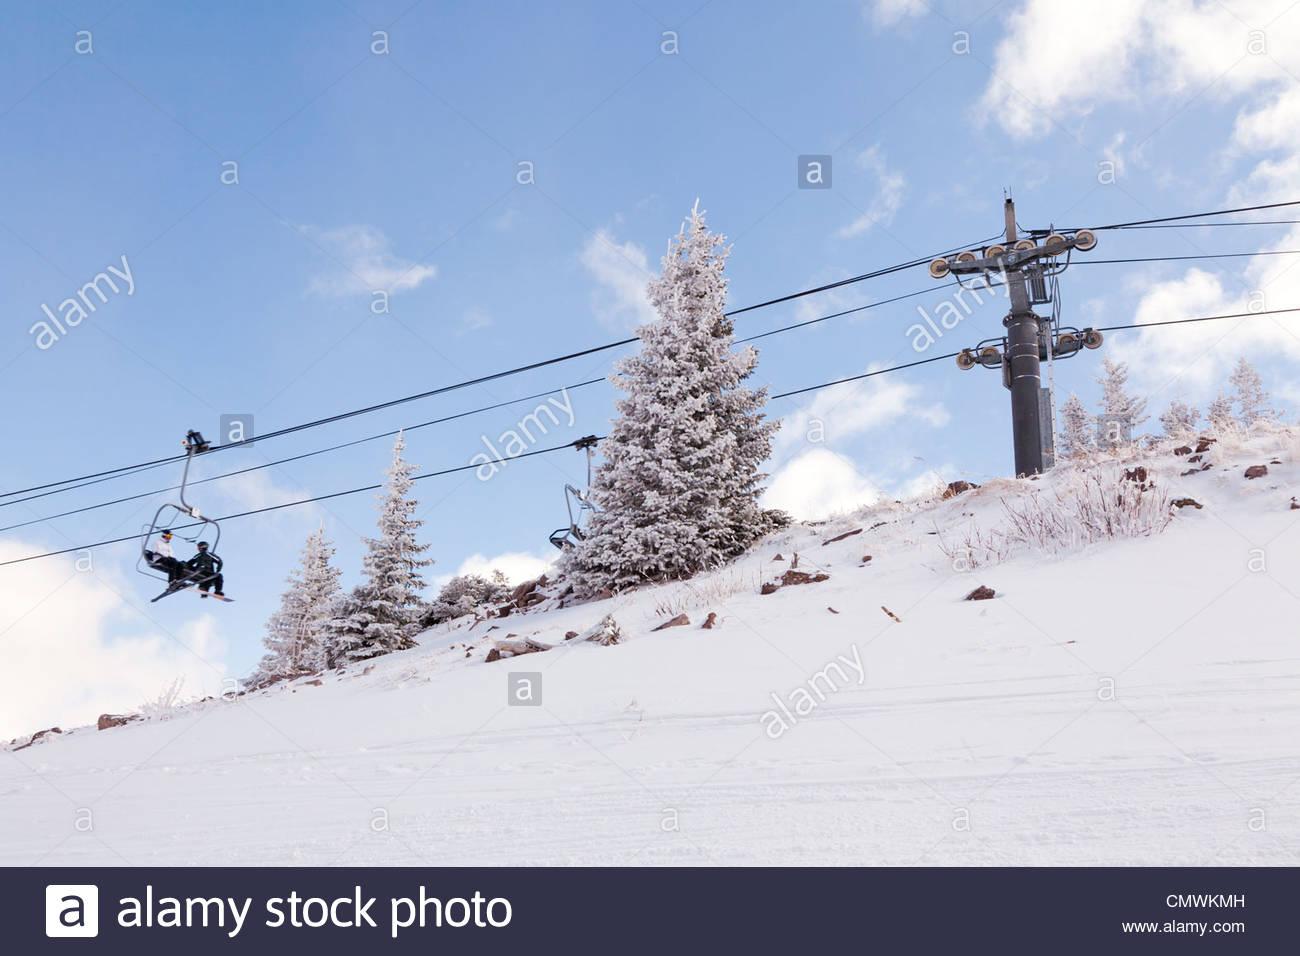 Cloud Nine lift over the Aspen Highlands. - Stock Image